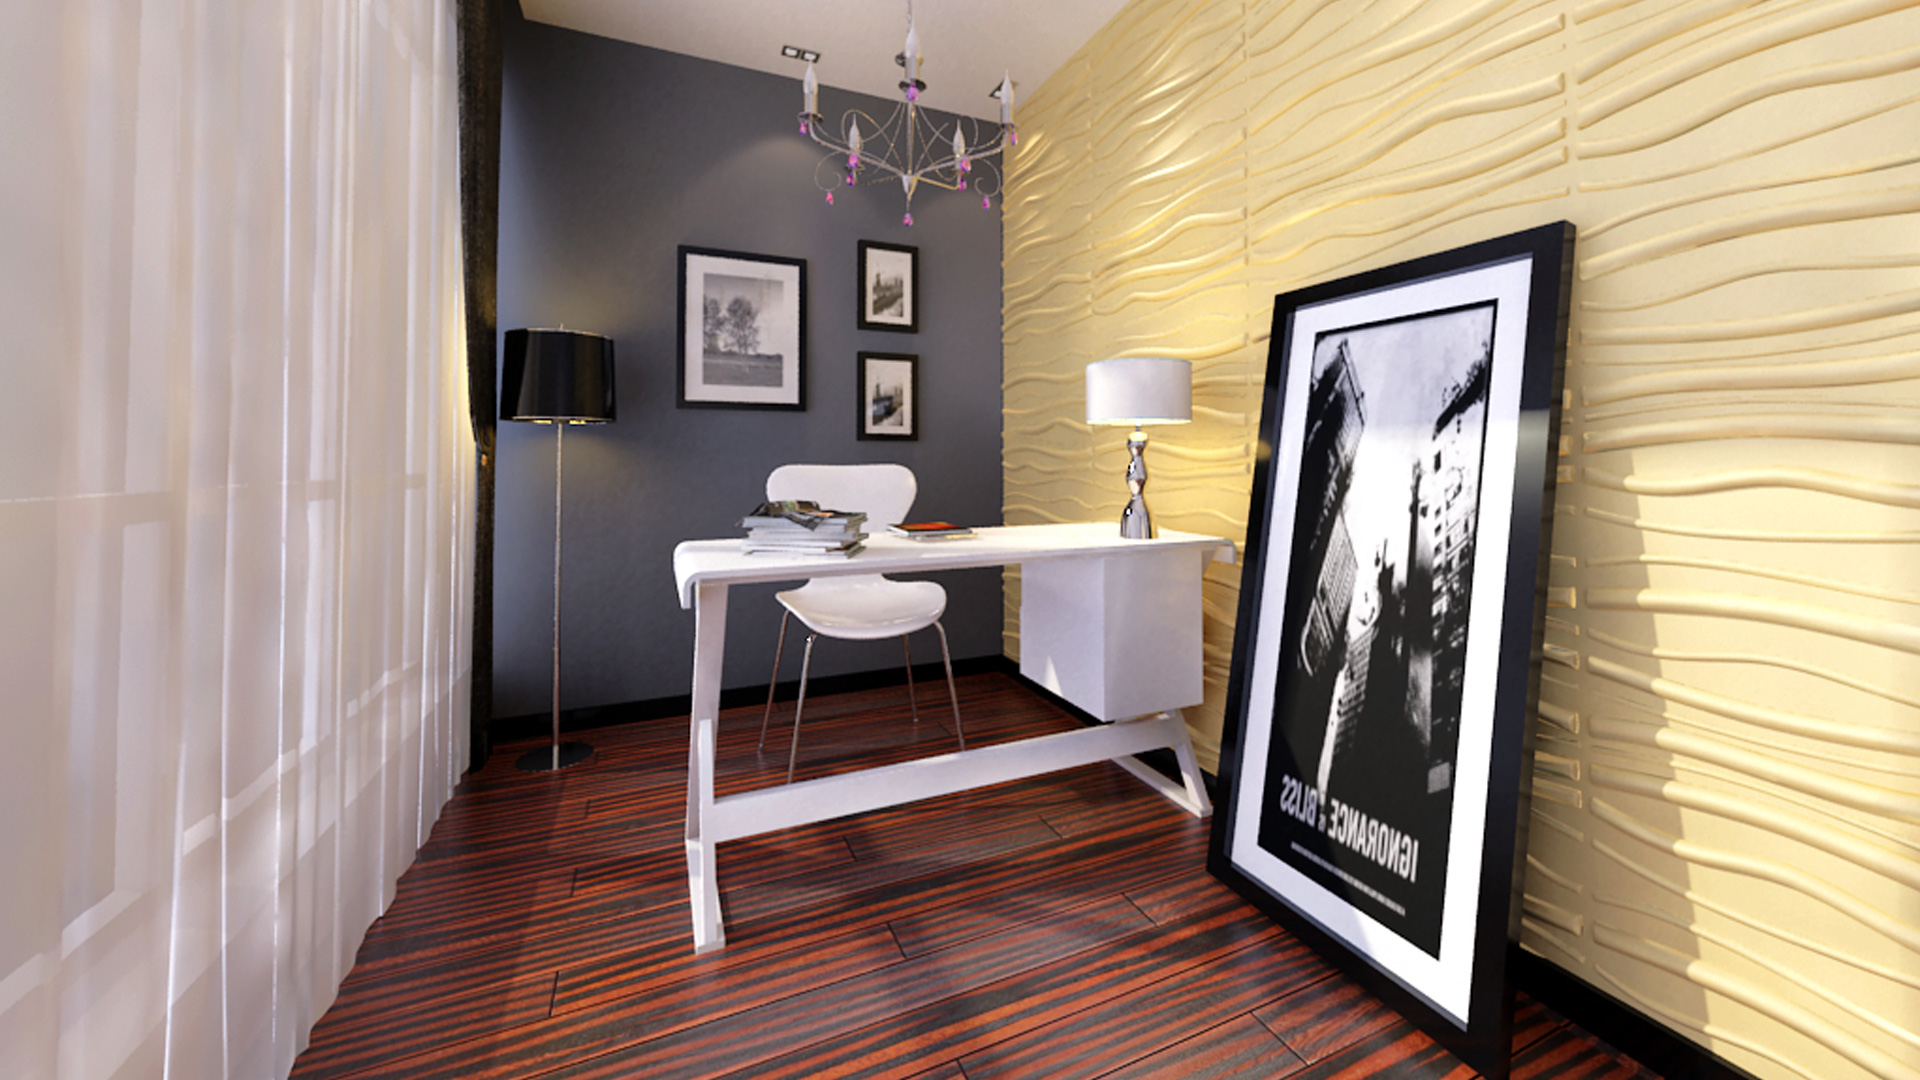 3D Wandpaneele - Produkte - Faktum - Deckenpaneele - 3D Tapeten - Wandverkleidung